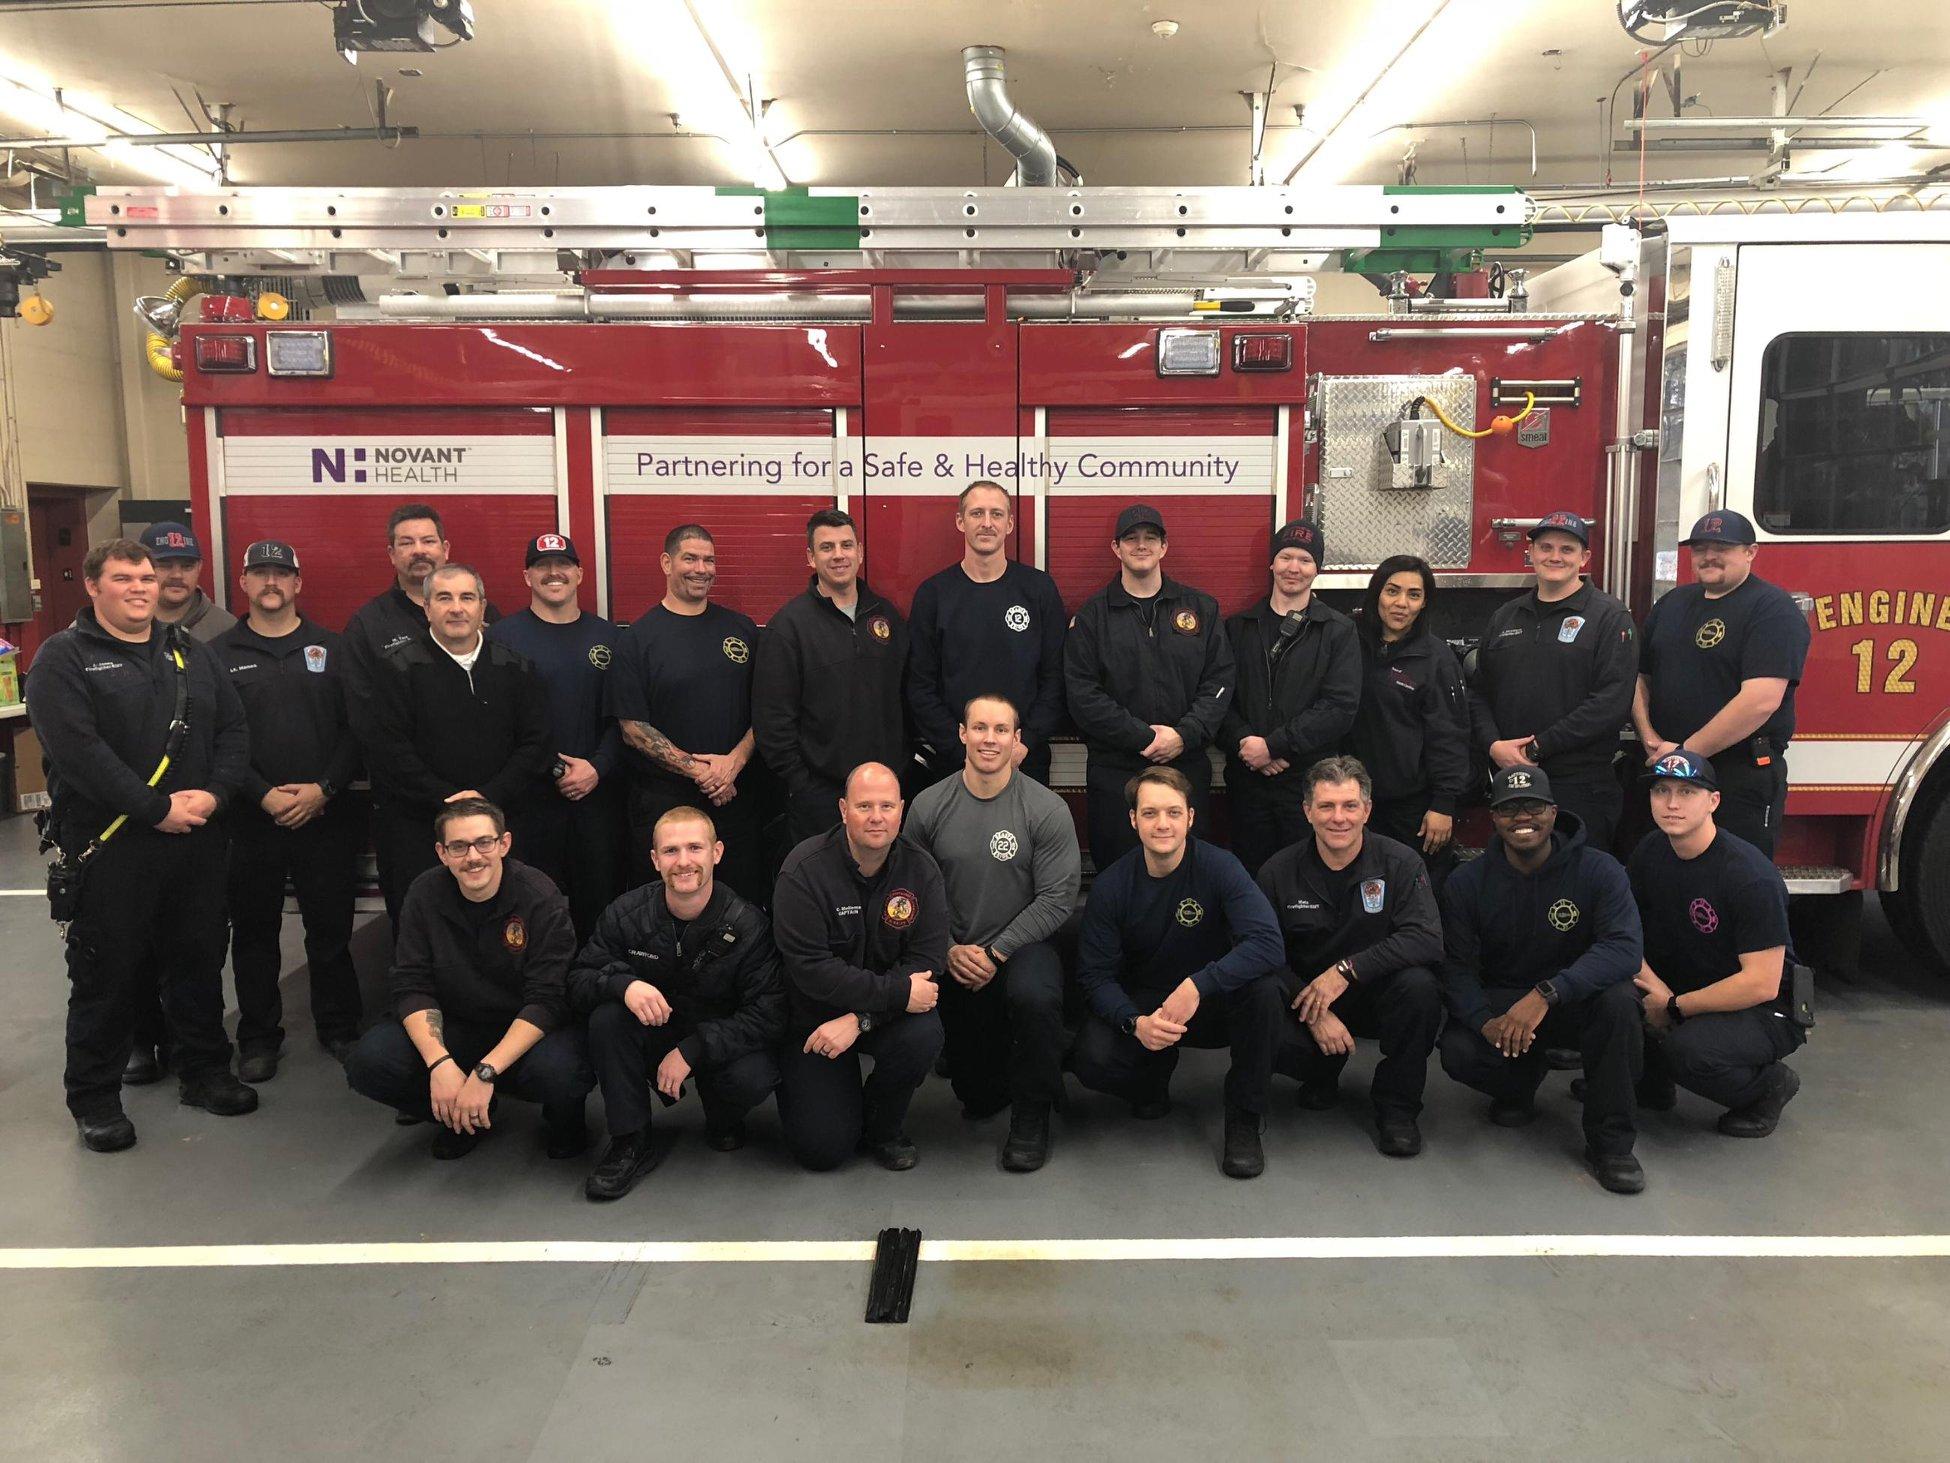 Photo courtesy the Matthews Fire & EMS Department